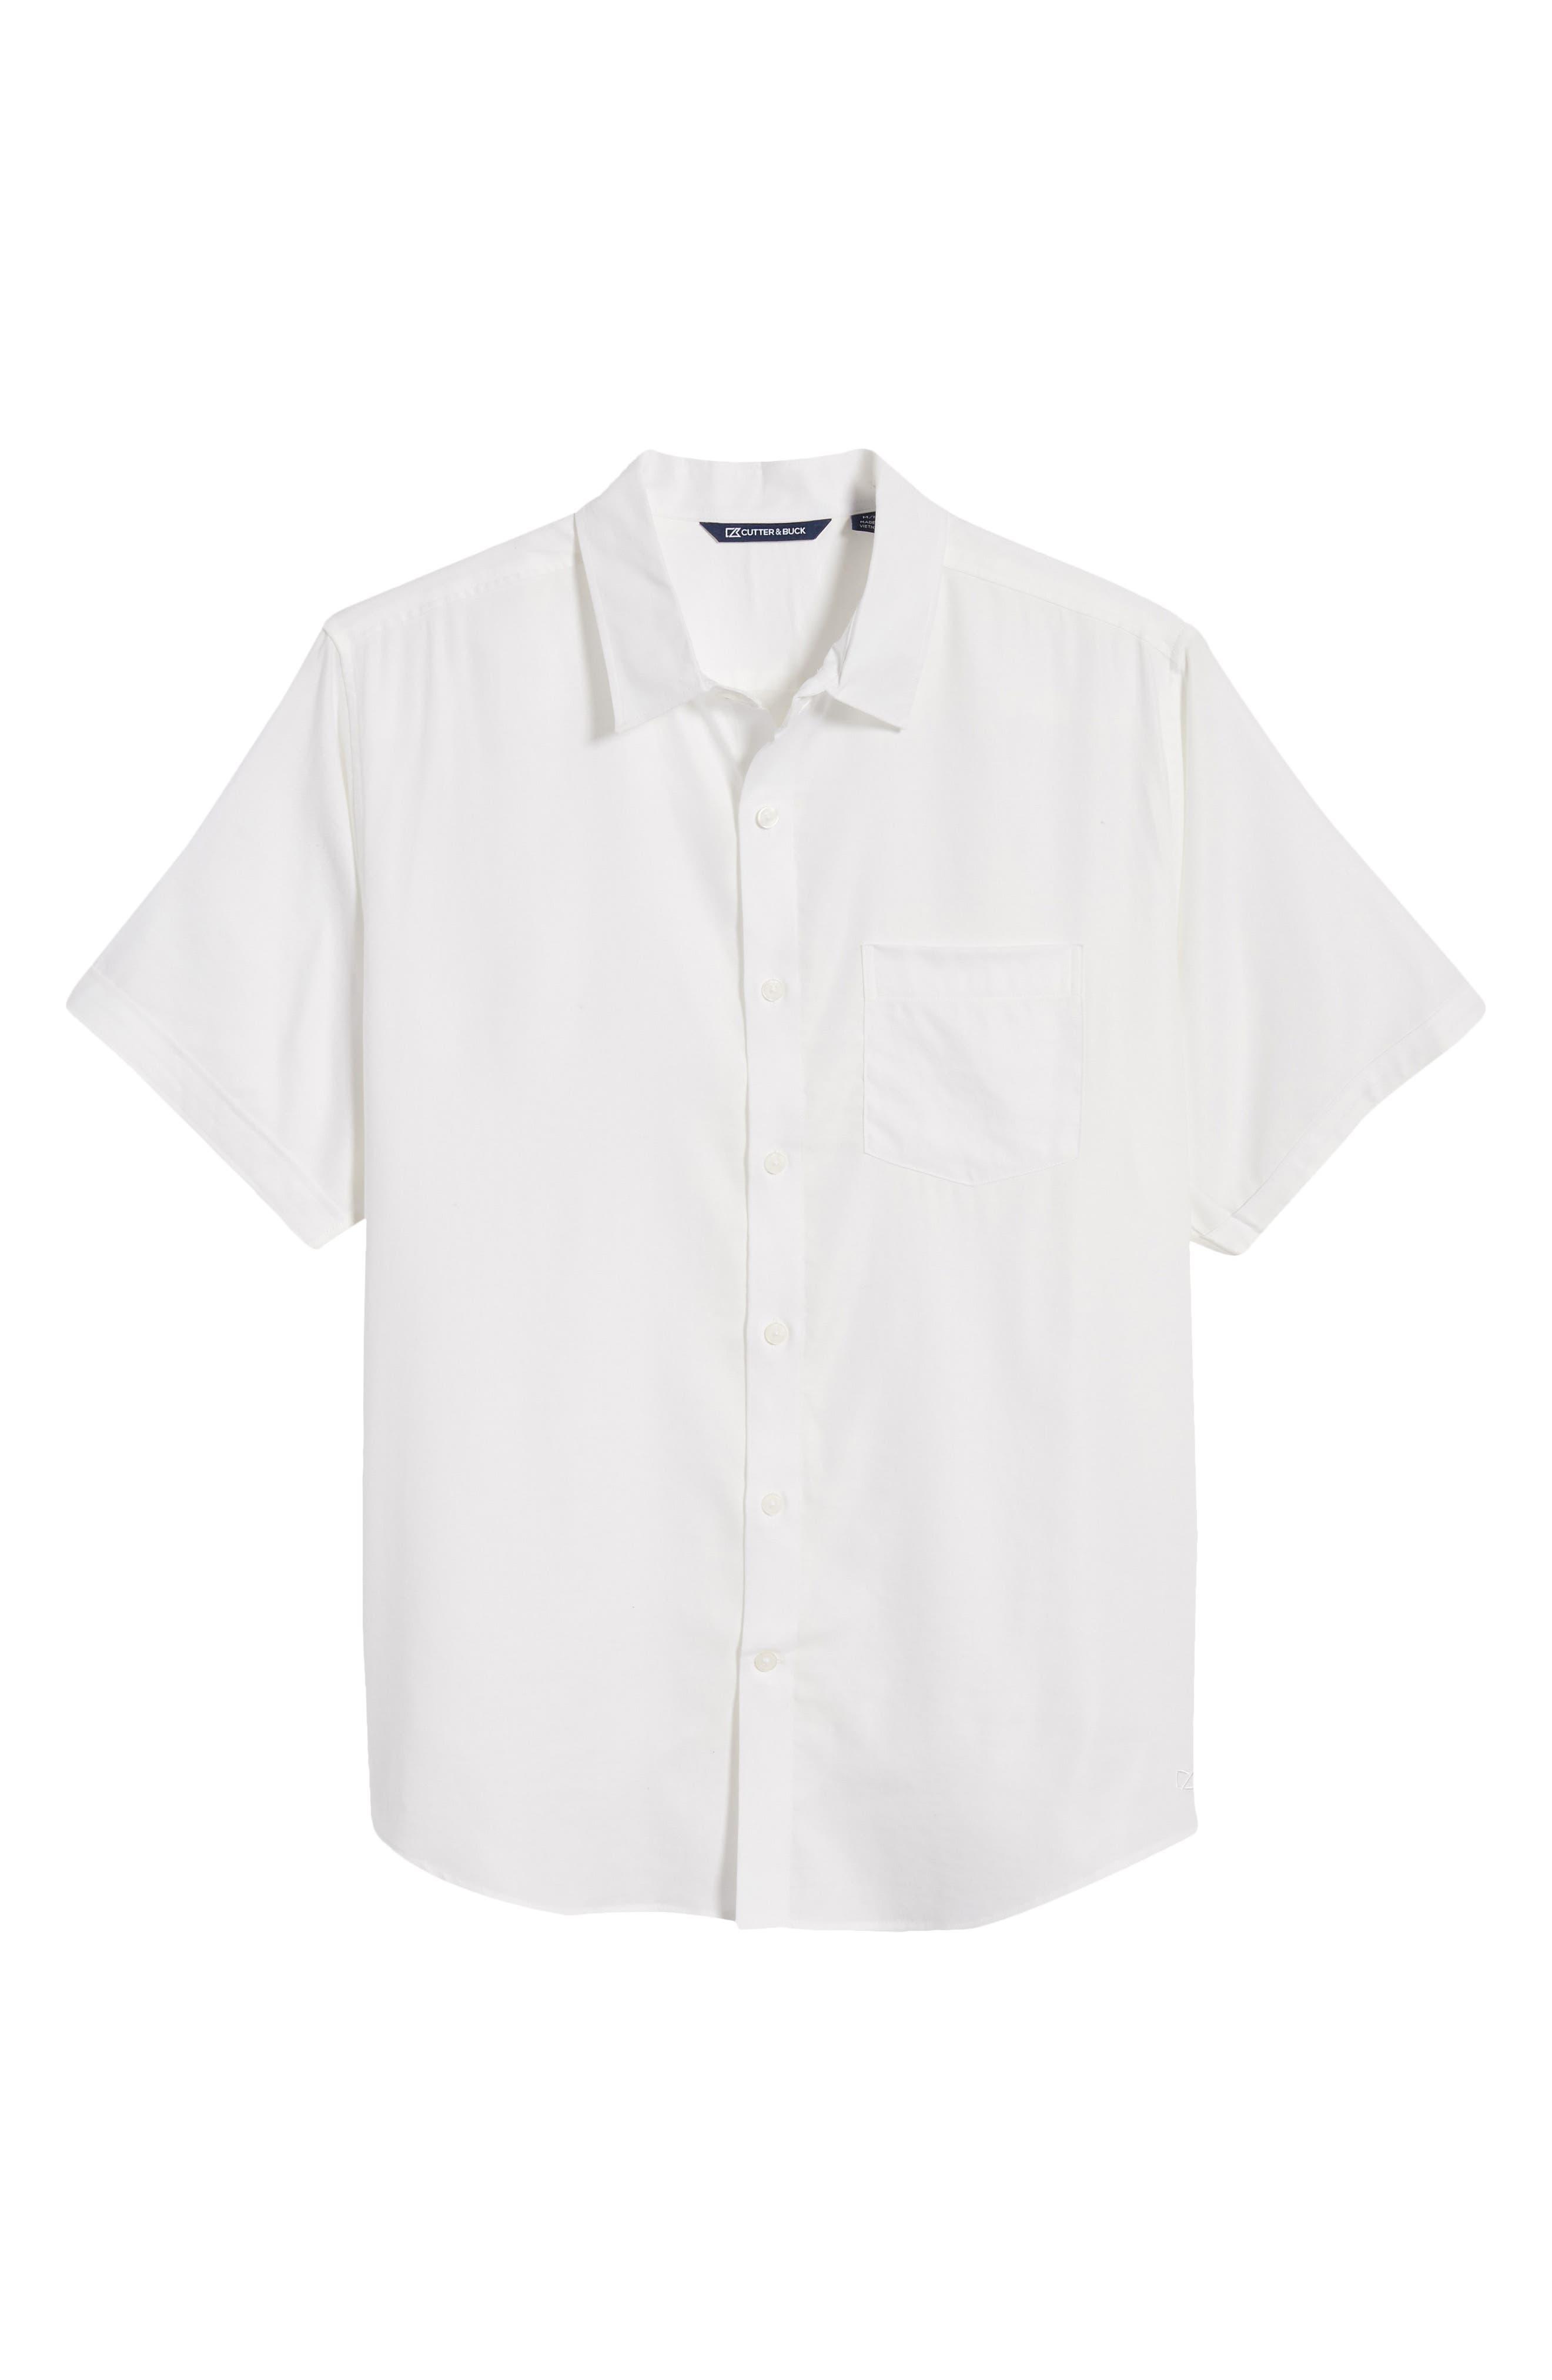 Windward Short Sleeve Twill Button-Up Shirt